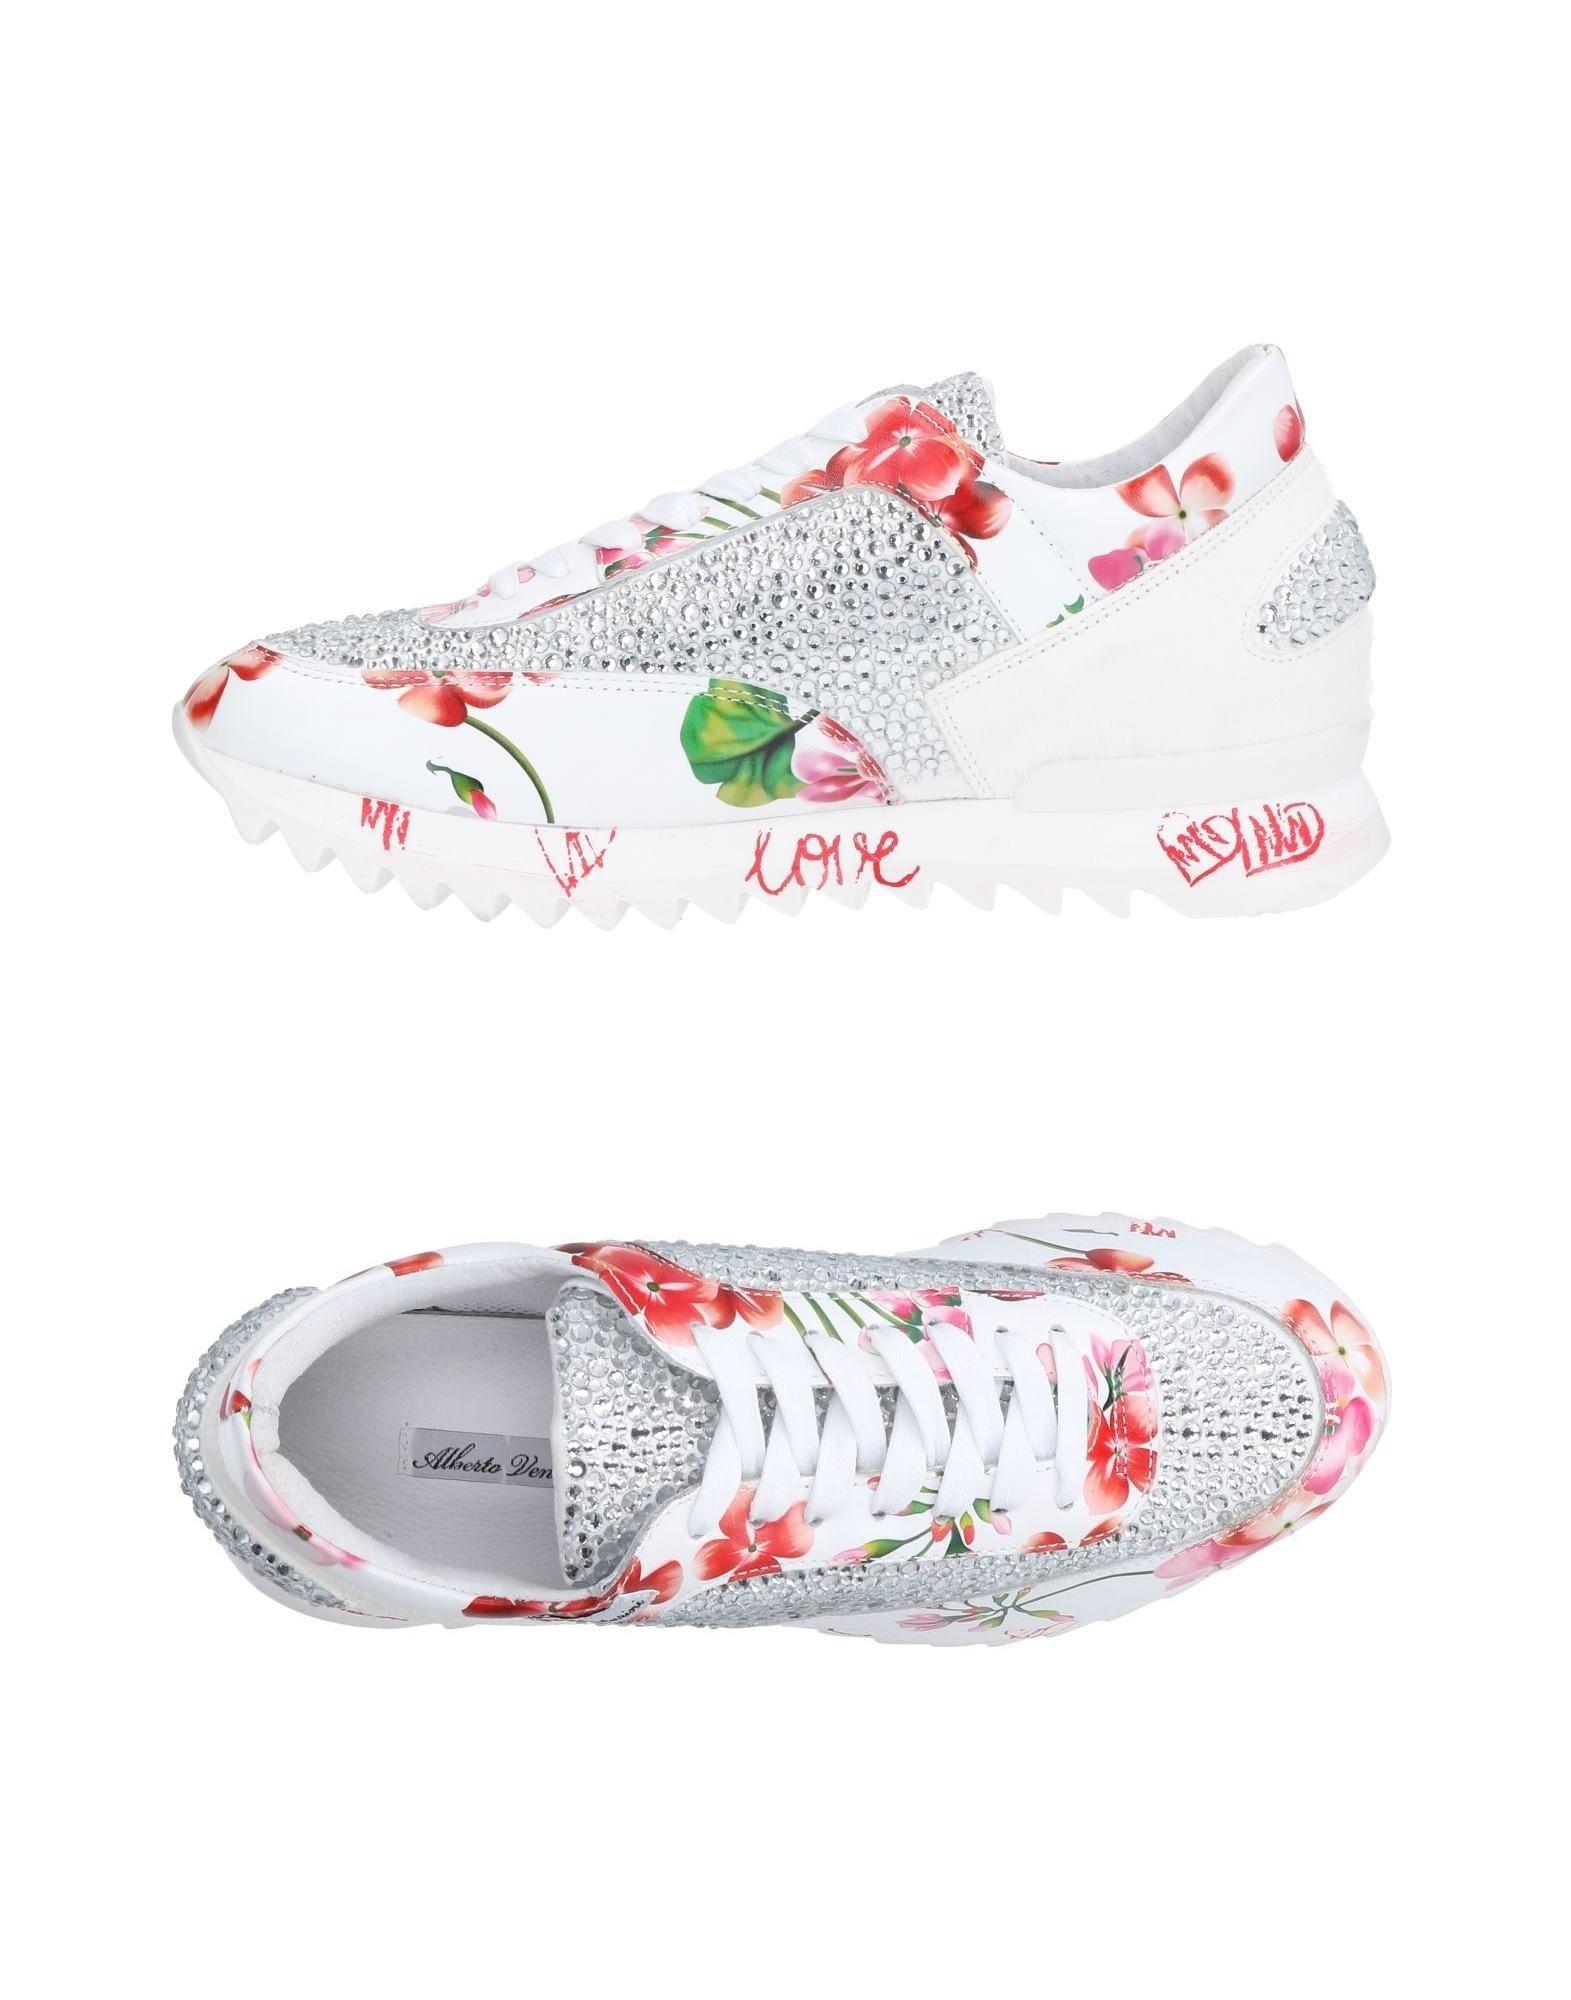 Alberto Venturini Sneakers Damen 11481729CK  11481729CK Damen  479064